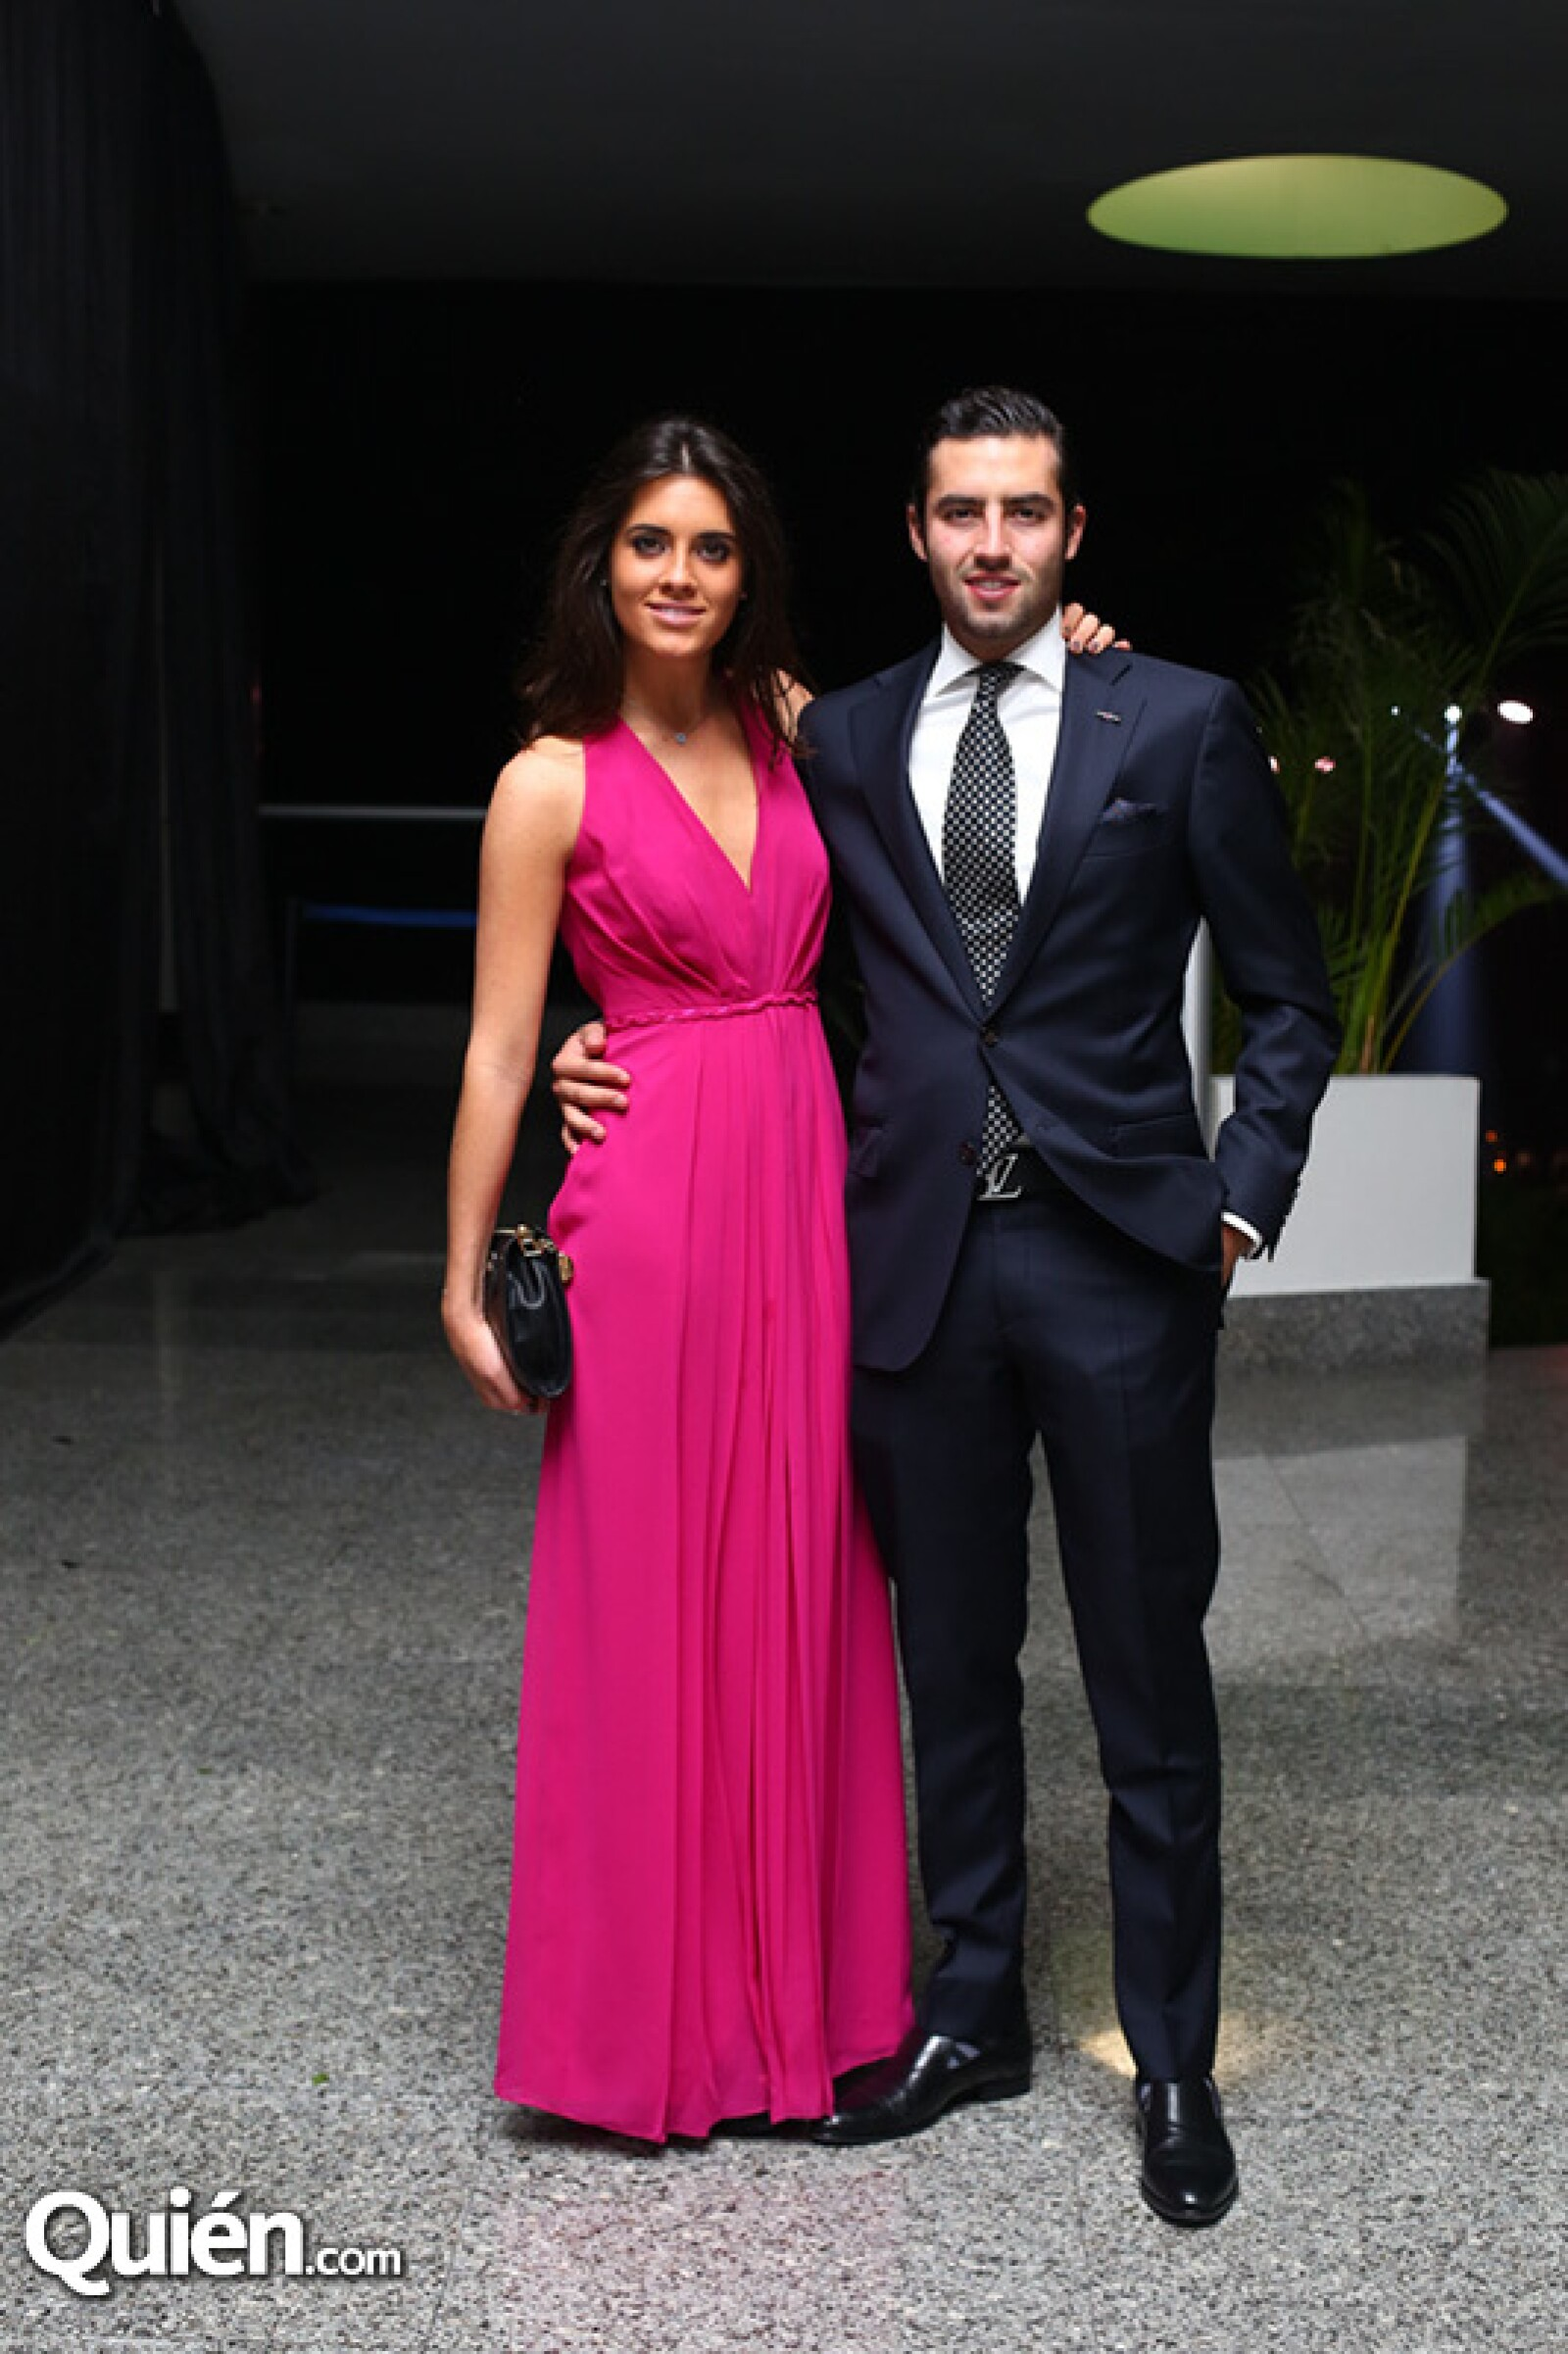 Ana Paula Igartua y Jorge Arozarena